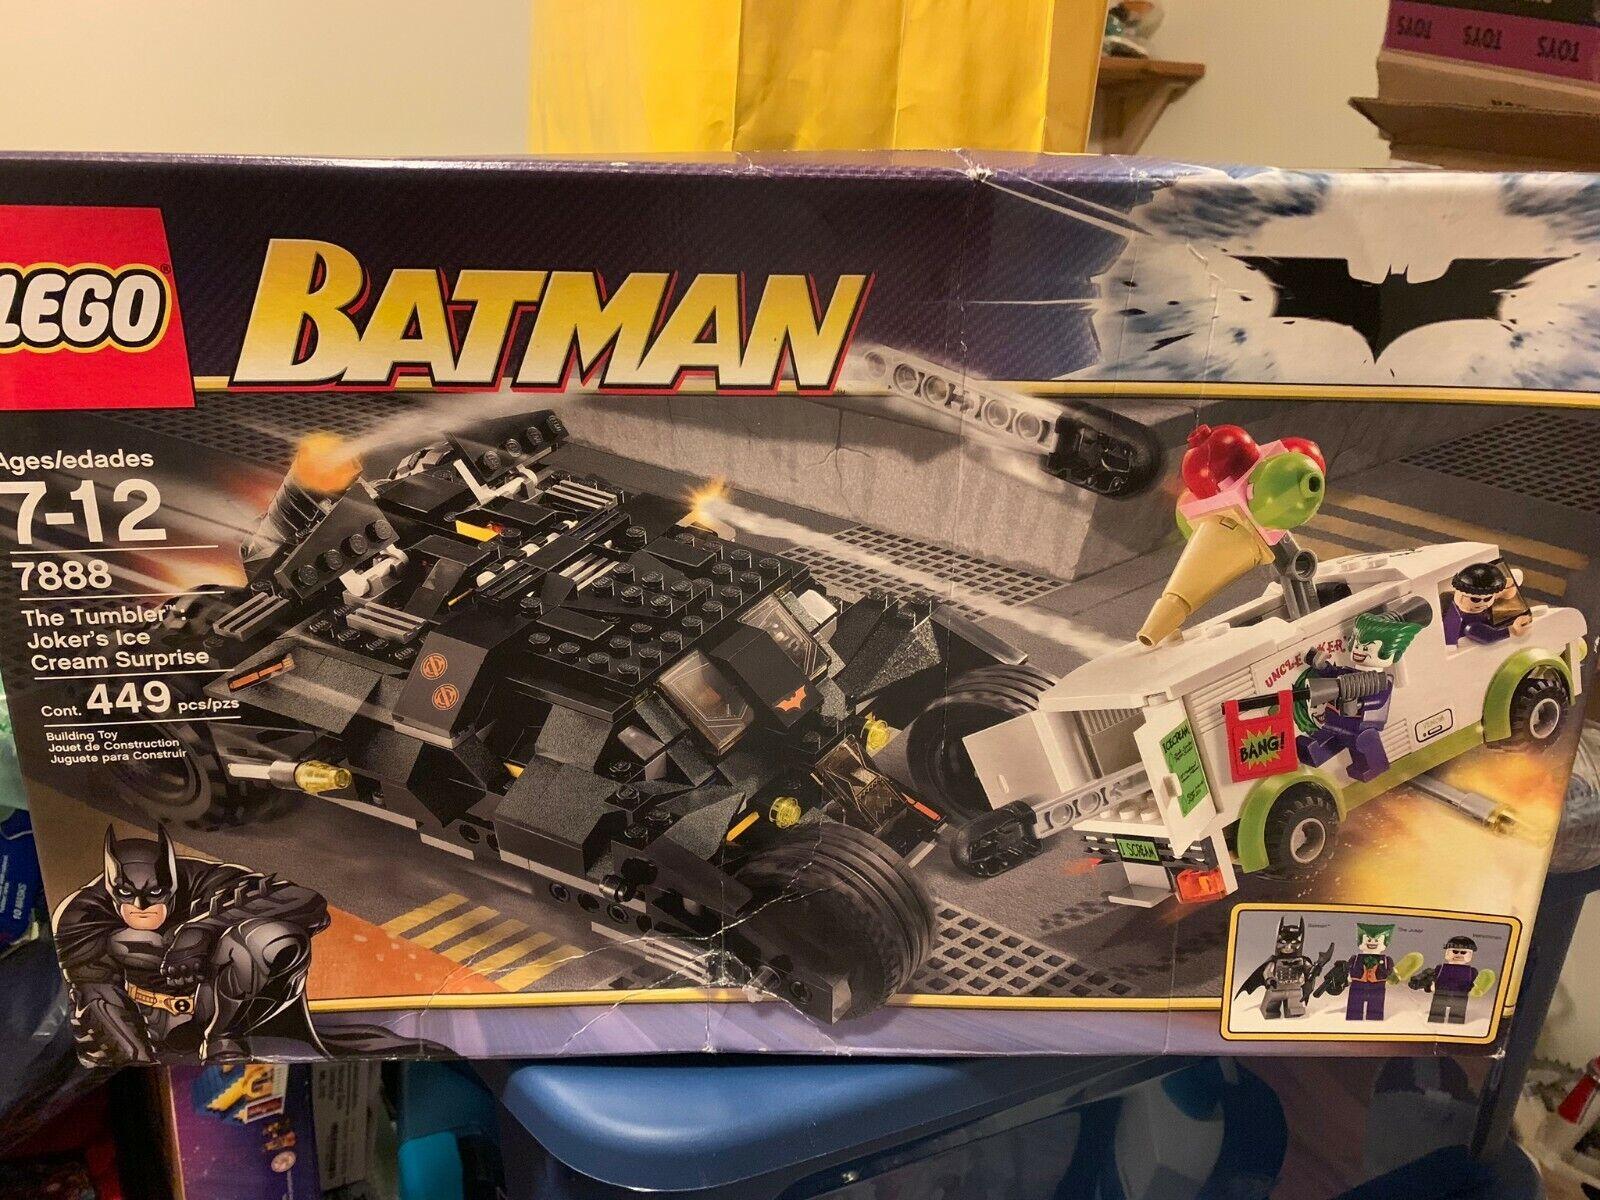 Lego Batman The Tumbler Joker S Ice Cream Surprise 7888 For Sale Online Ebay